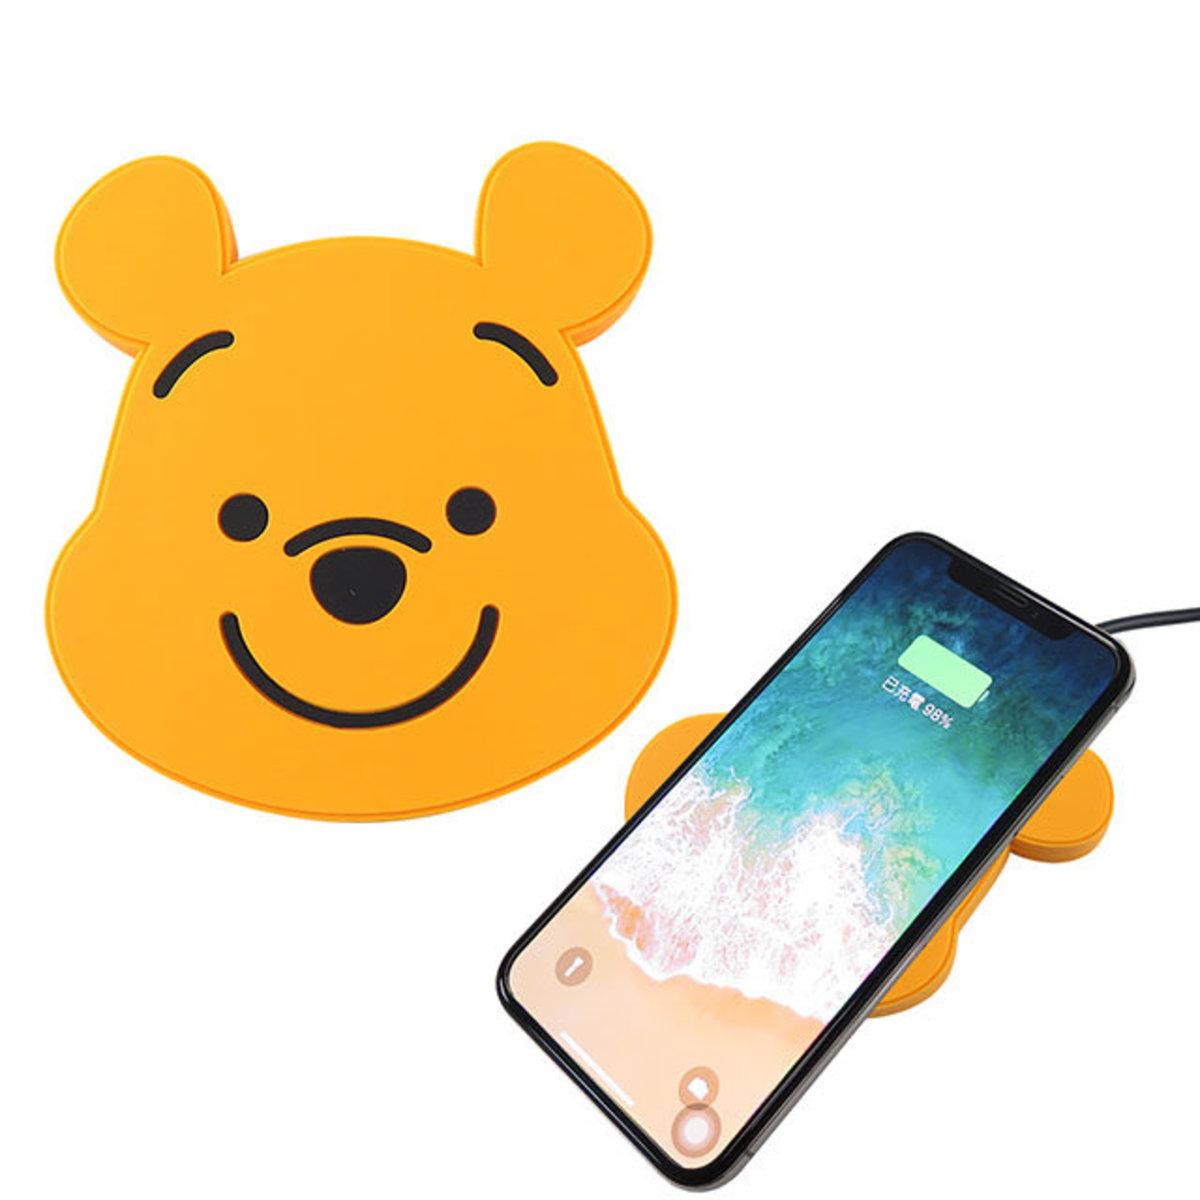 Disney Winnie the Pooh Wireless Charging Pad